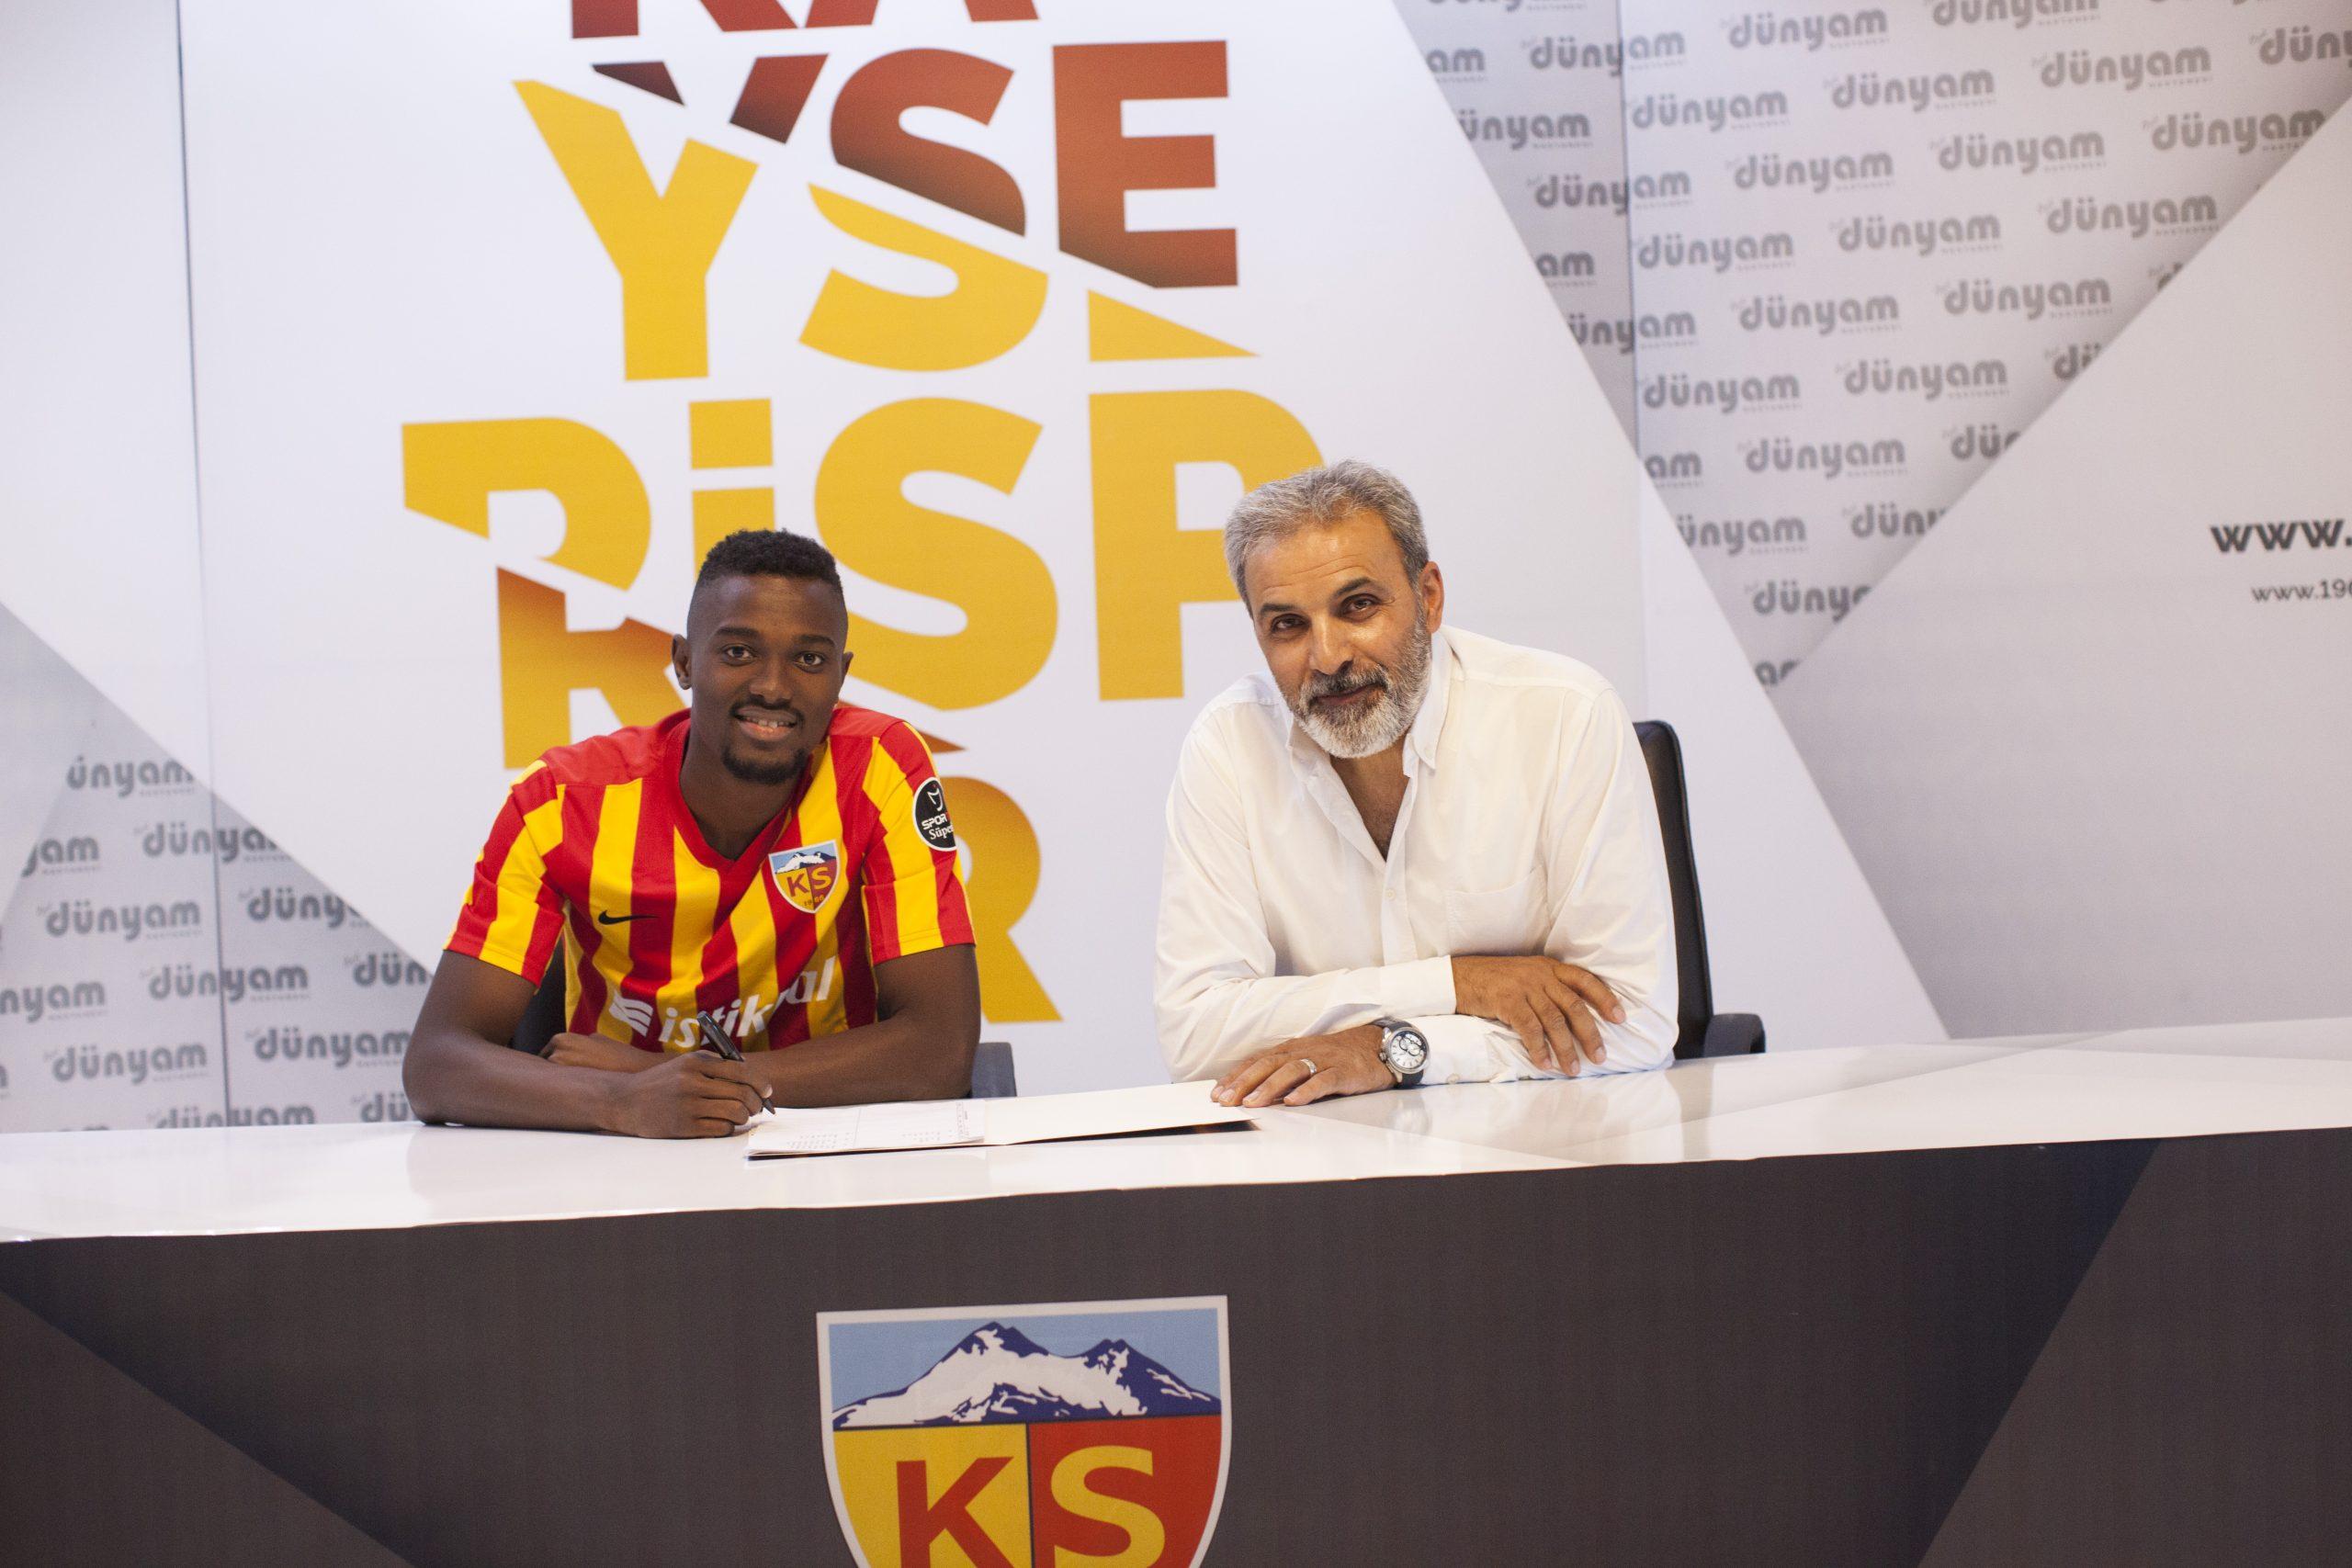 Tony Baffoe wants Asamoah Gyan to 'take care' of Mensah at Kayserispor